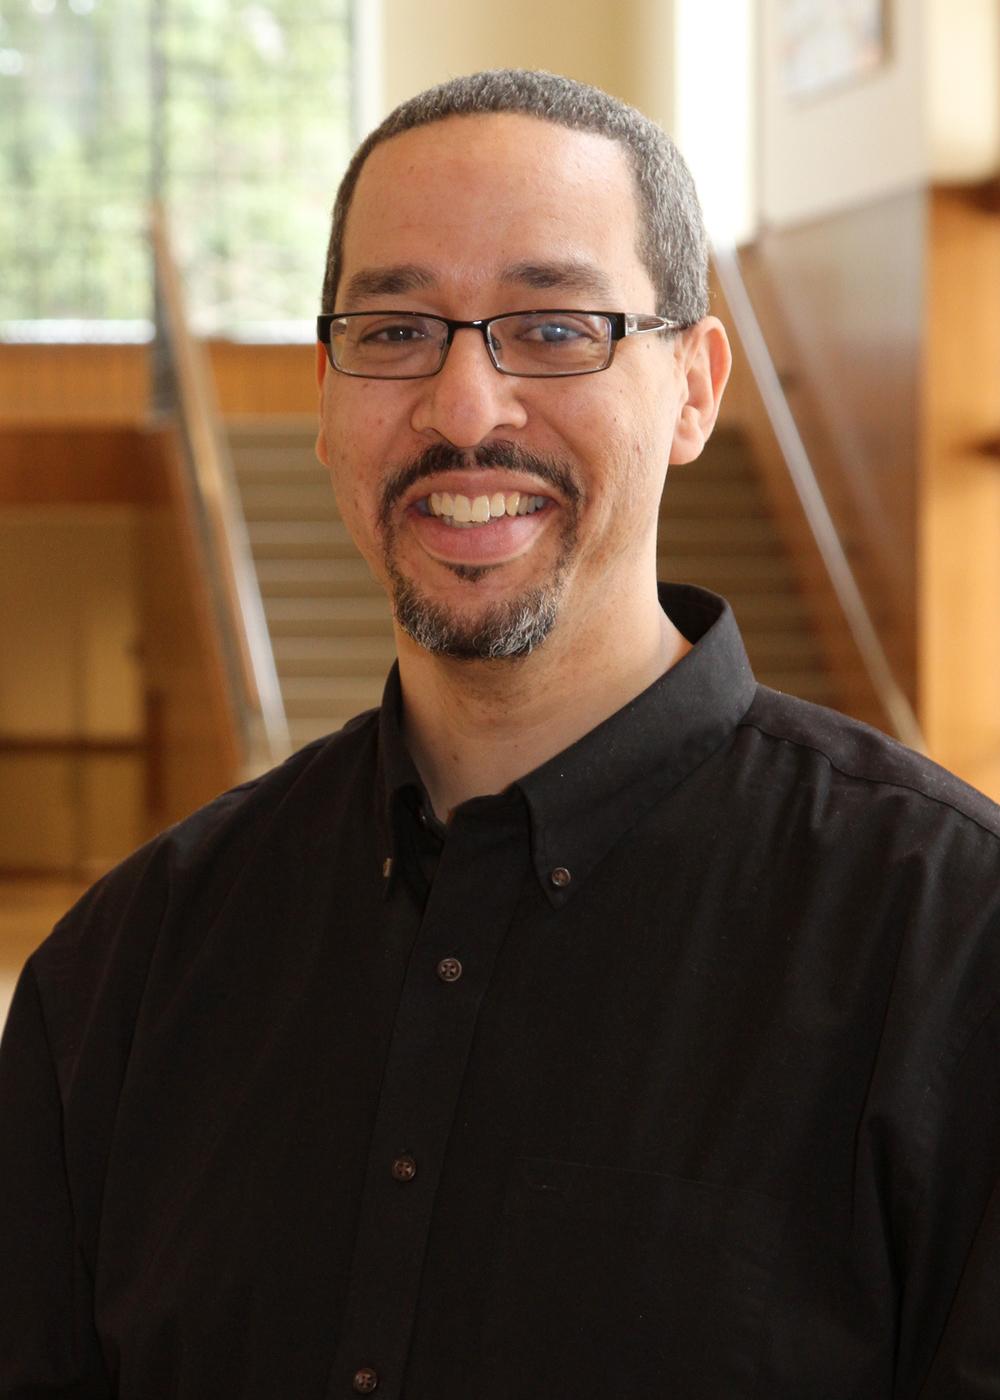 Daniel M. Harris